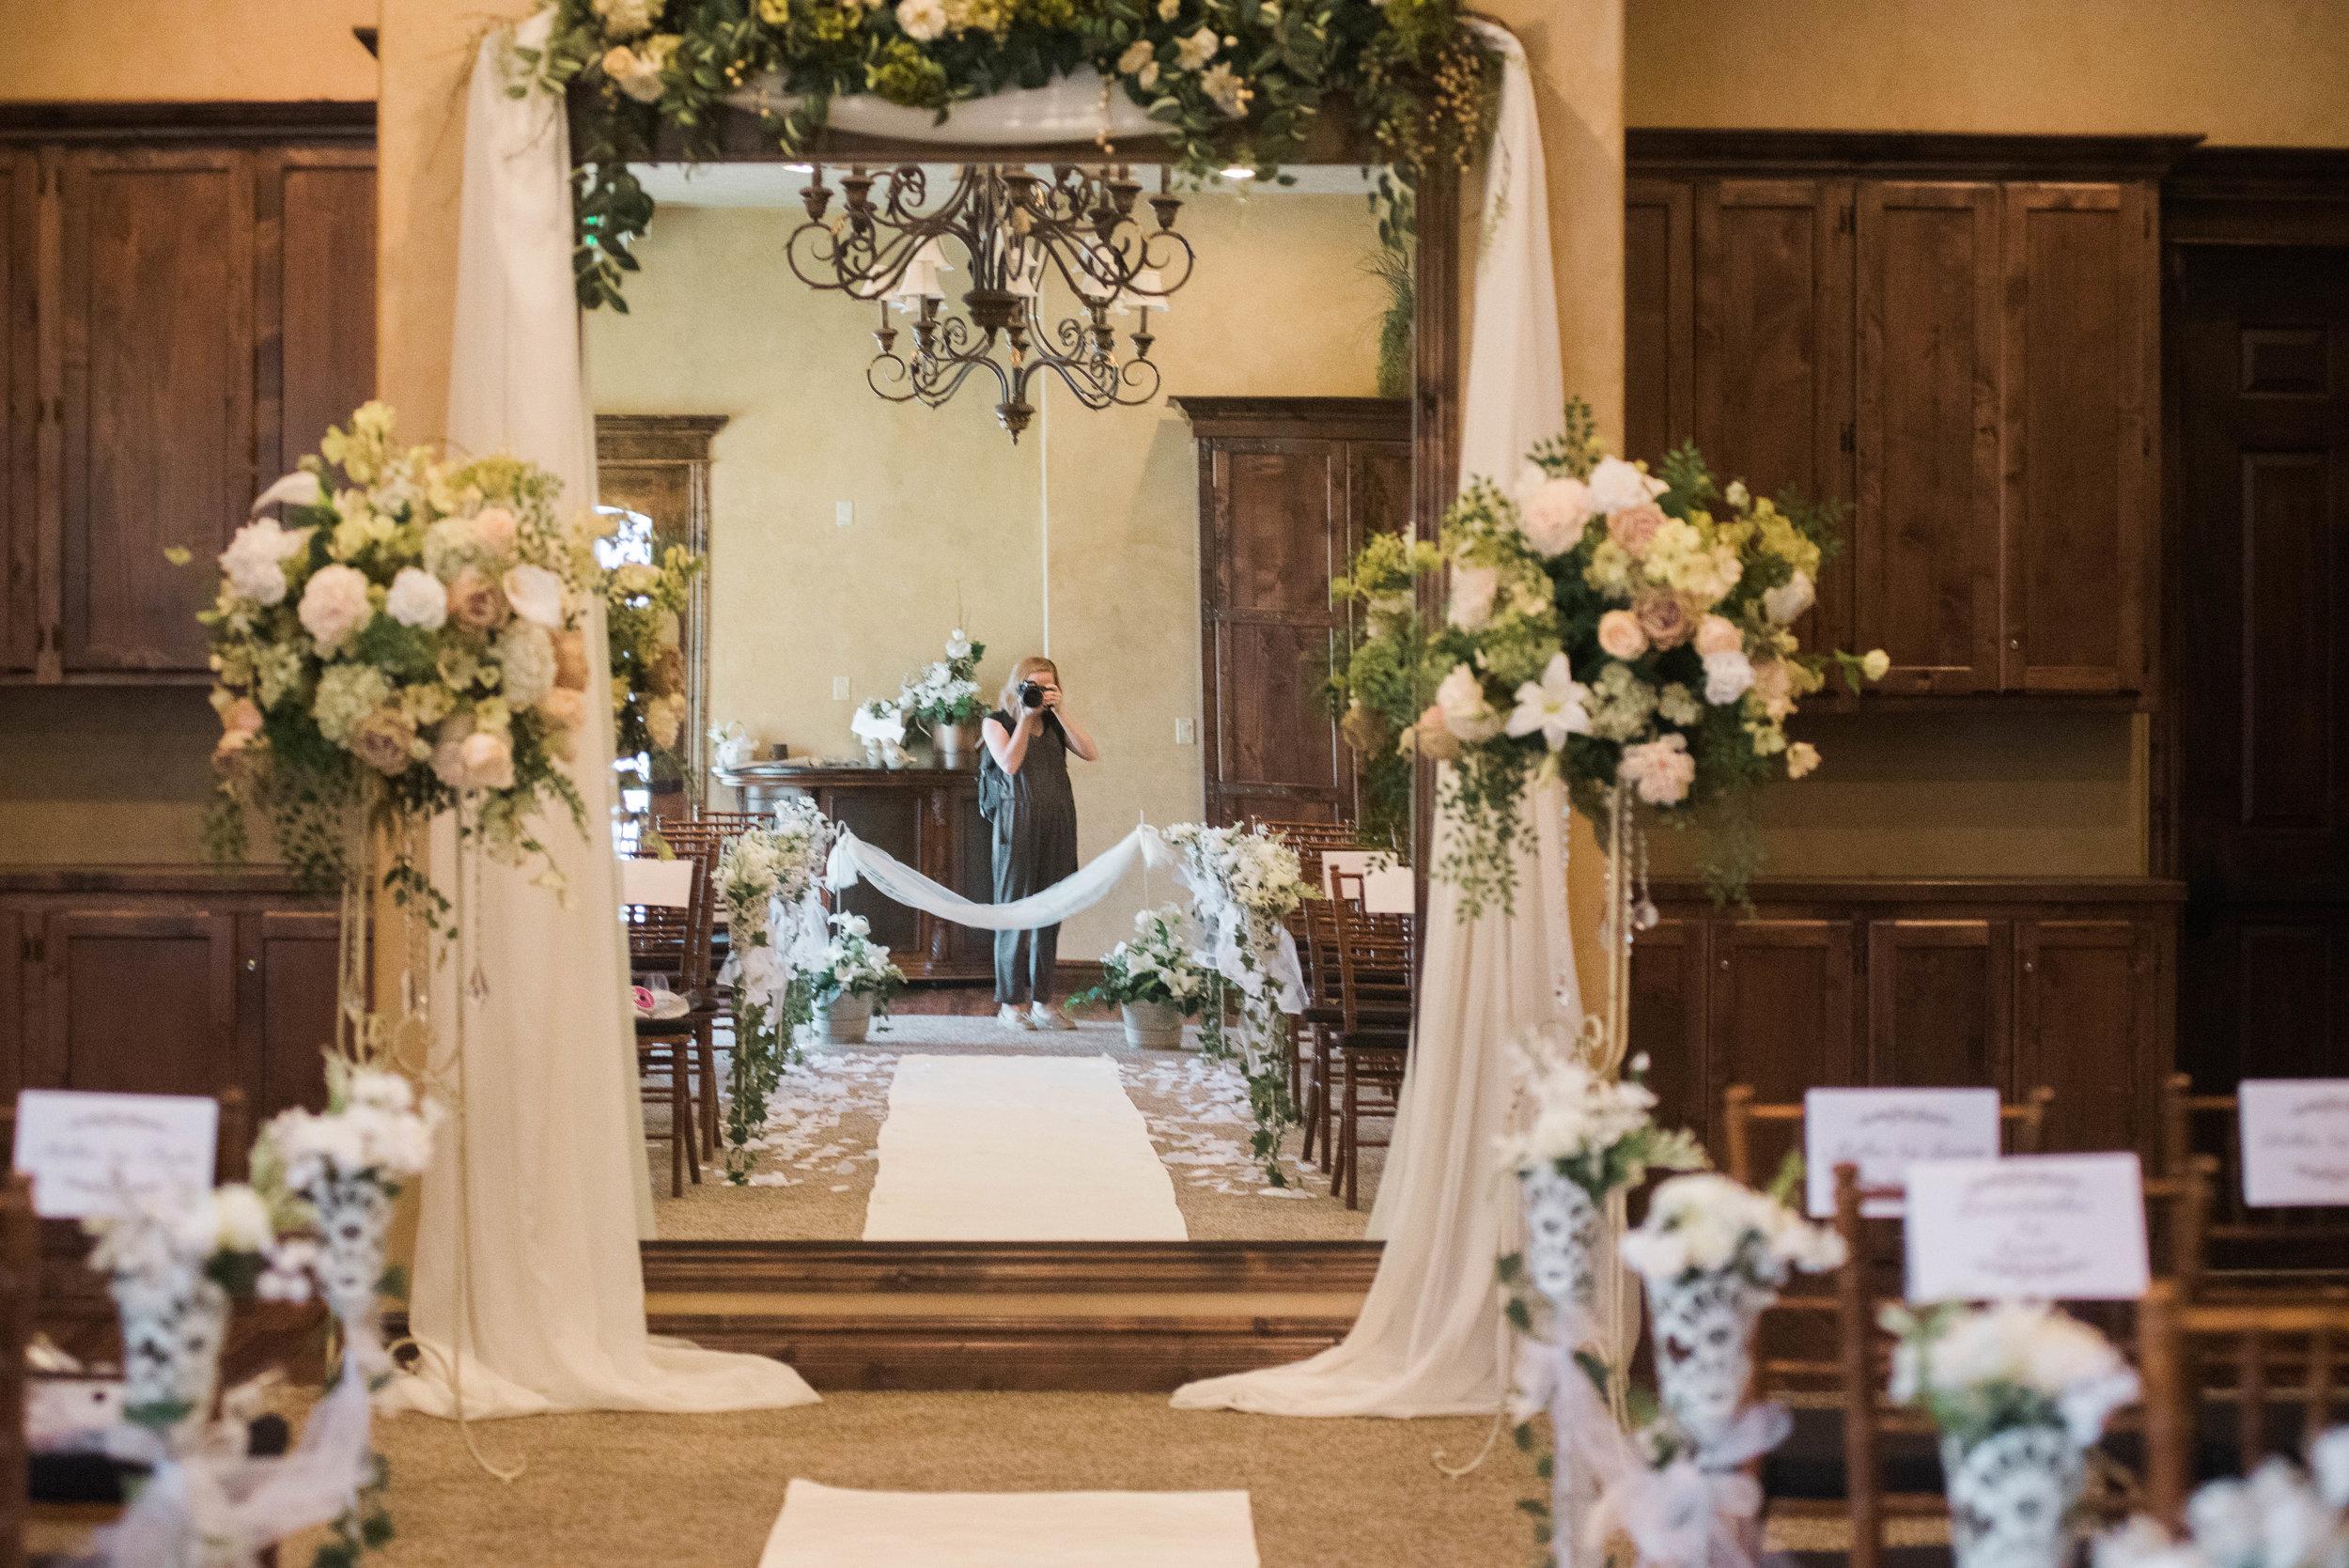 DANIEL+LACI-WEDDING-Sadie_Banks_Photography-14.jpg